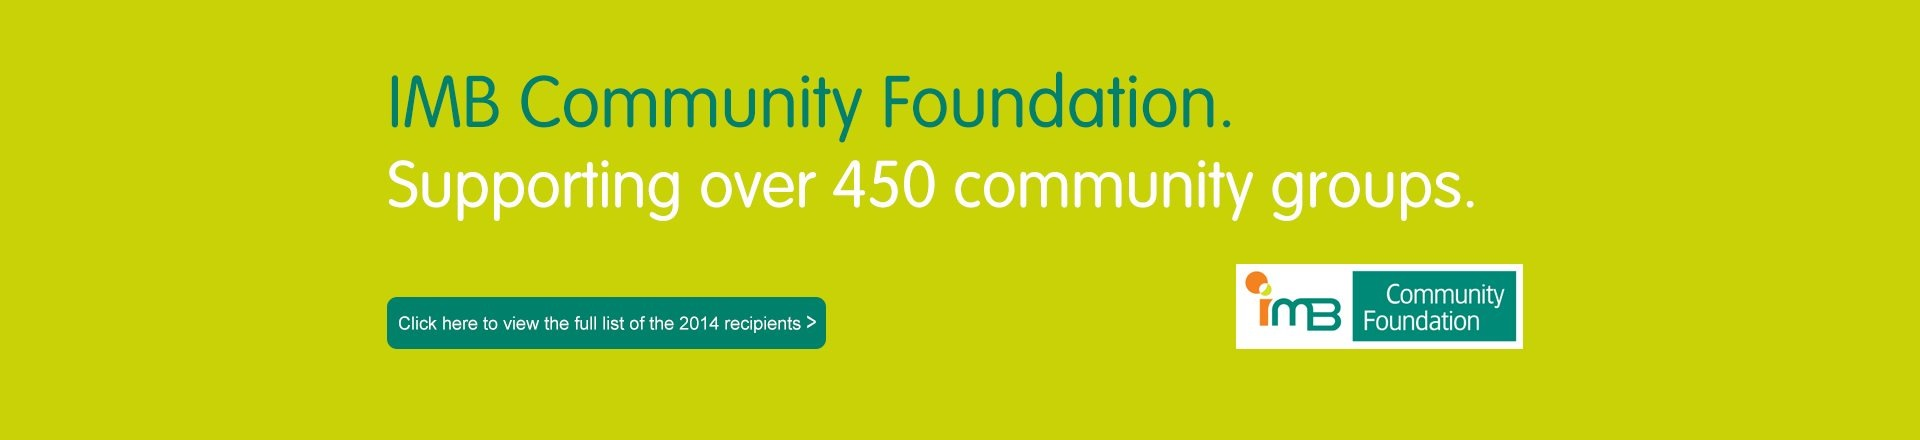 IMB | Community Foundation